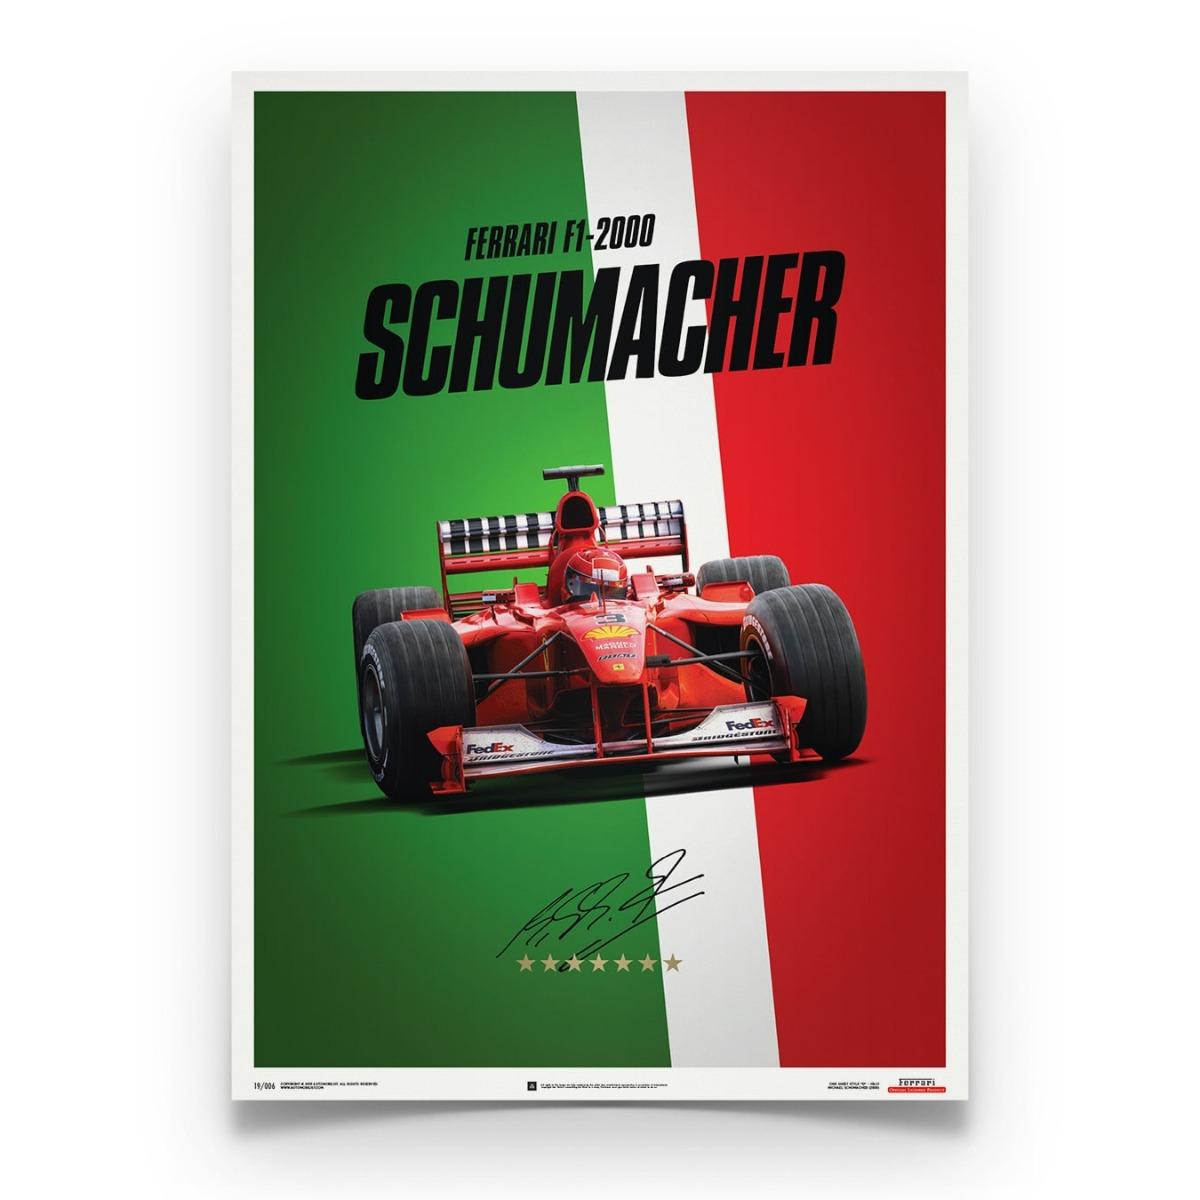 Ferrari F1-2000 - Michael Schumacher - Italy - Suzuka GP